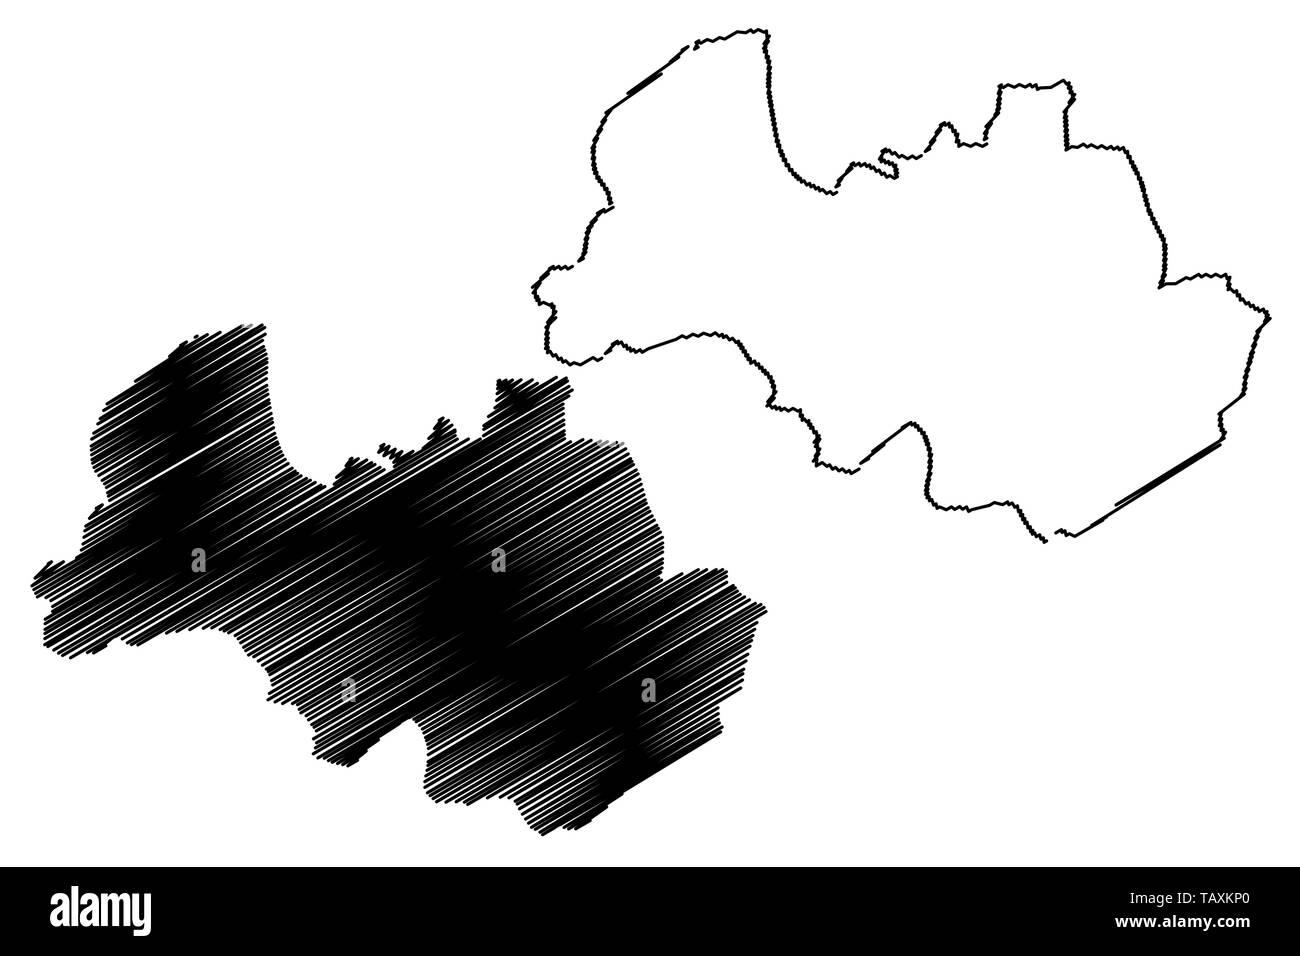 Al Bayda Governorate (Governorates of Yemen, Republic of Yemen) map vector illustration, scribble sketch Al Bayda map - Stock Vector